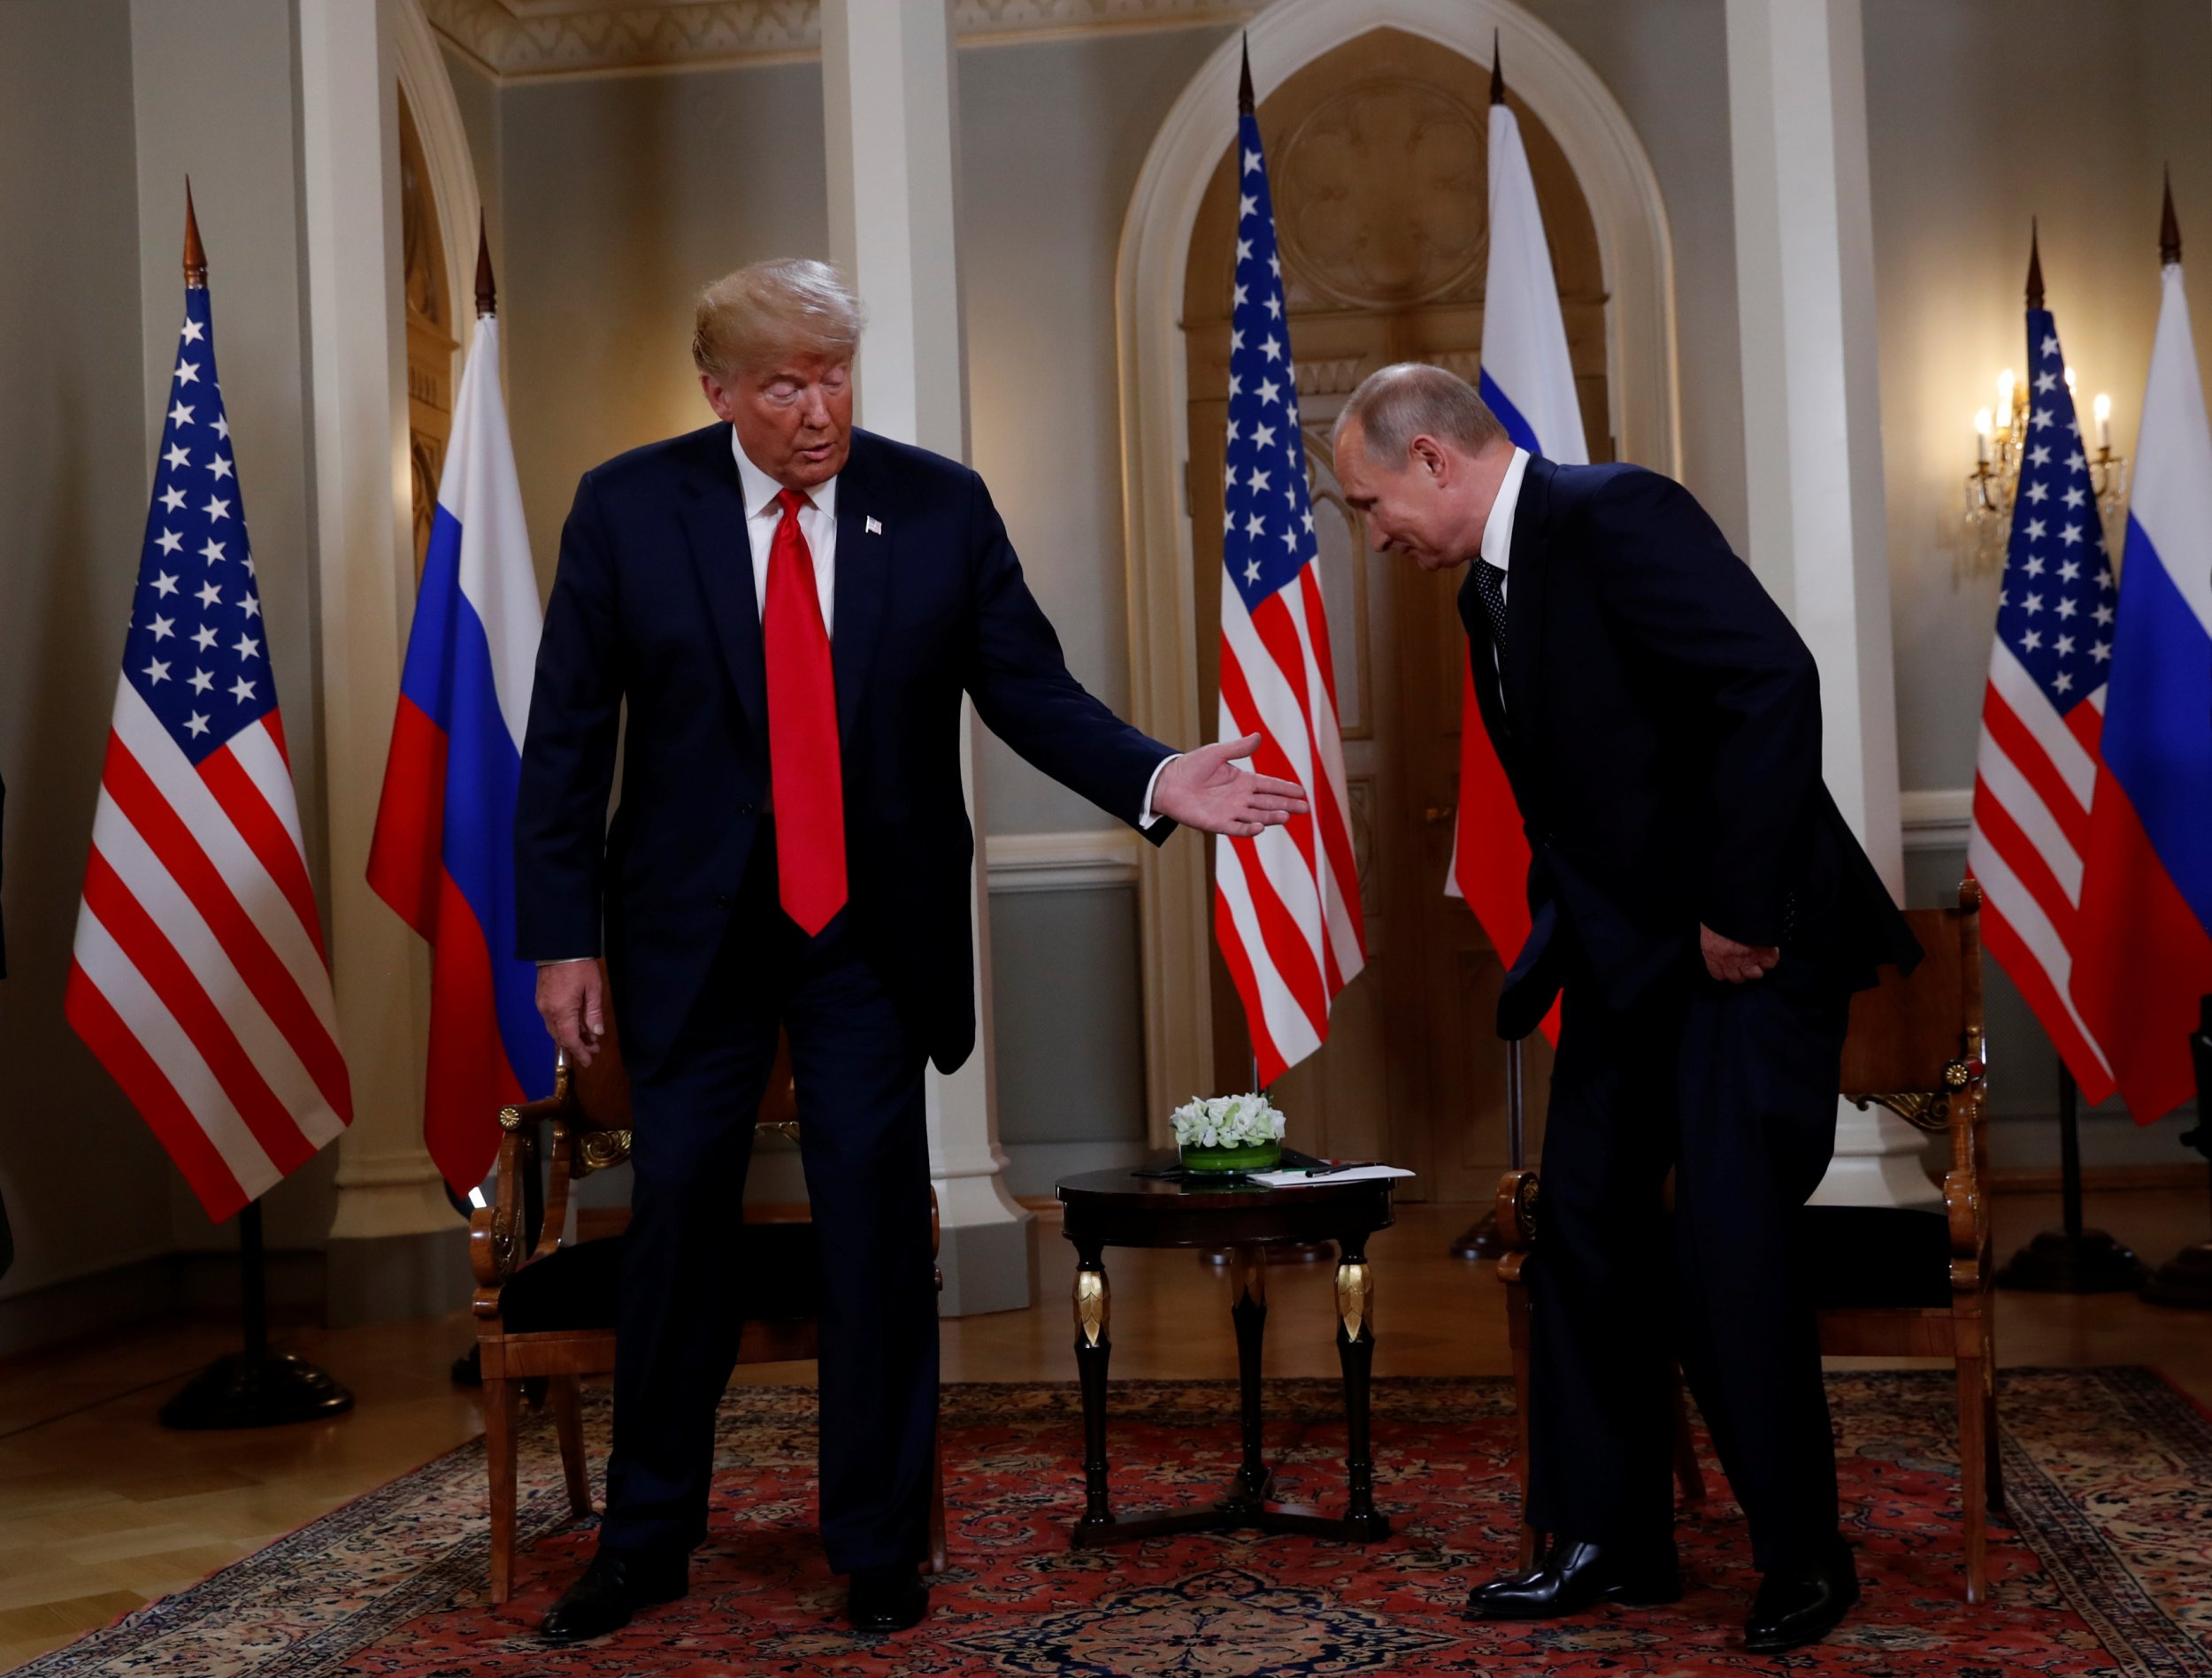 2018-07-16T112002Z_1_LYNXMPEE6F11Y_RTROPTP_4_USA-RUSSIA-SUMMIT